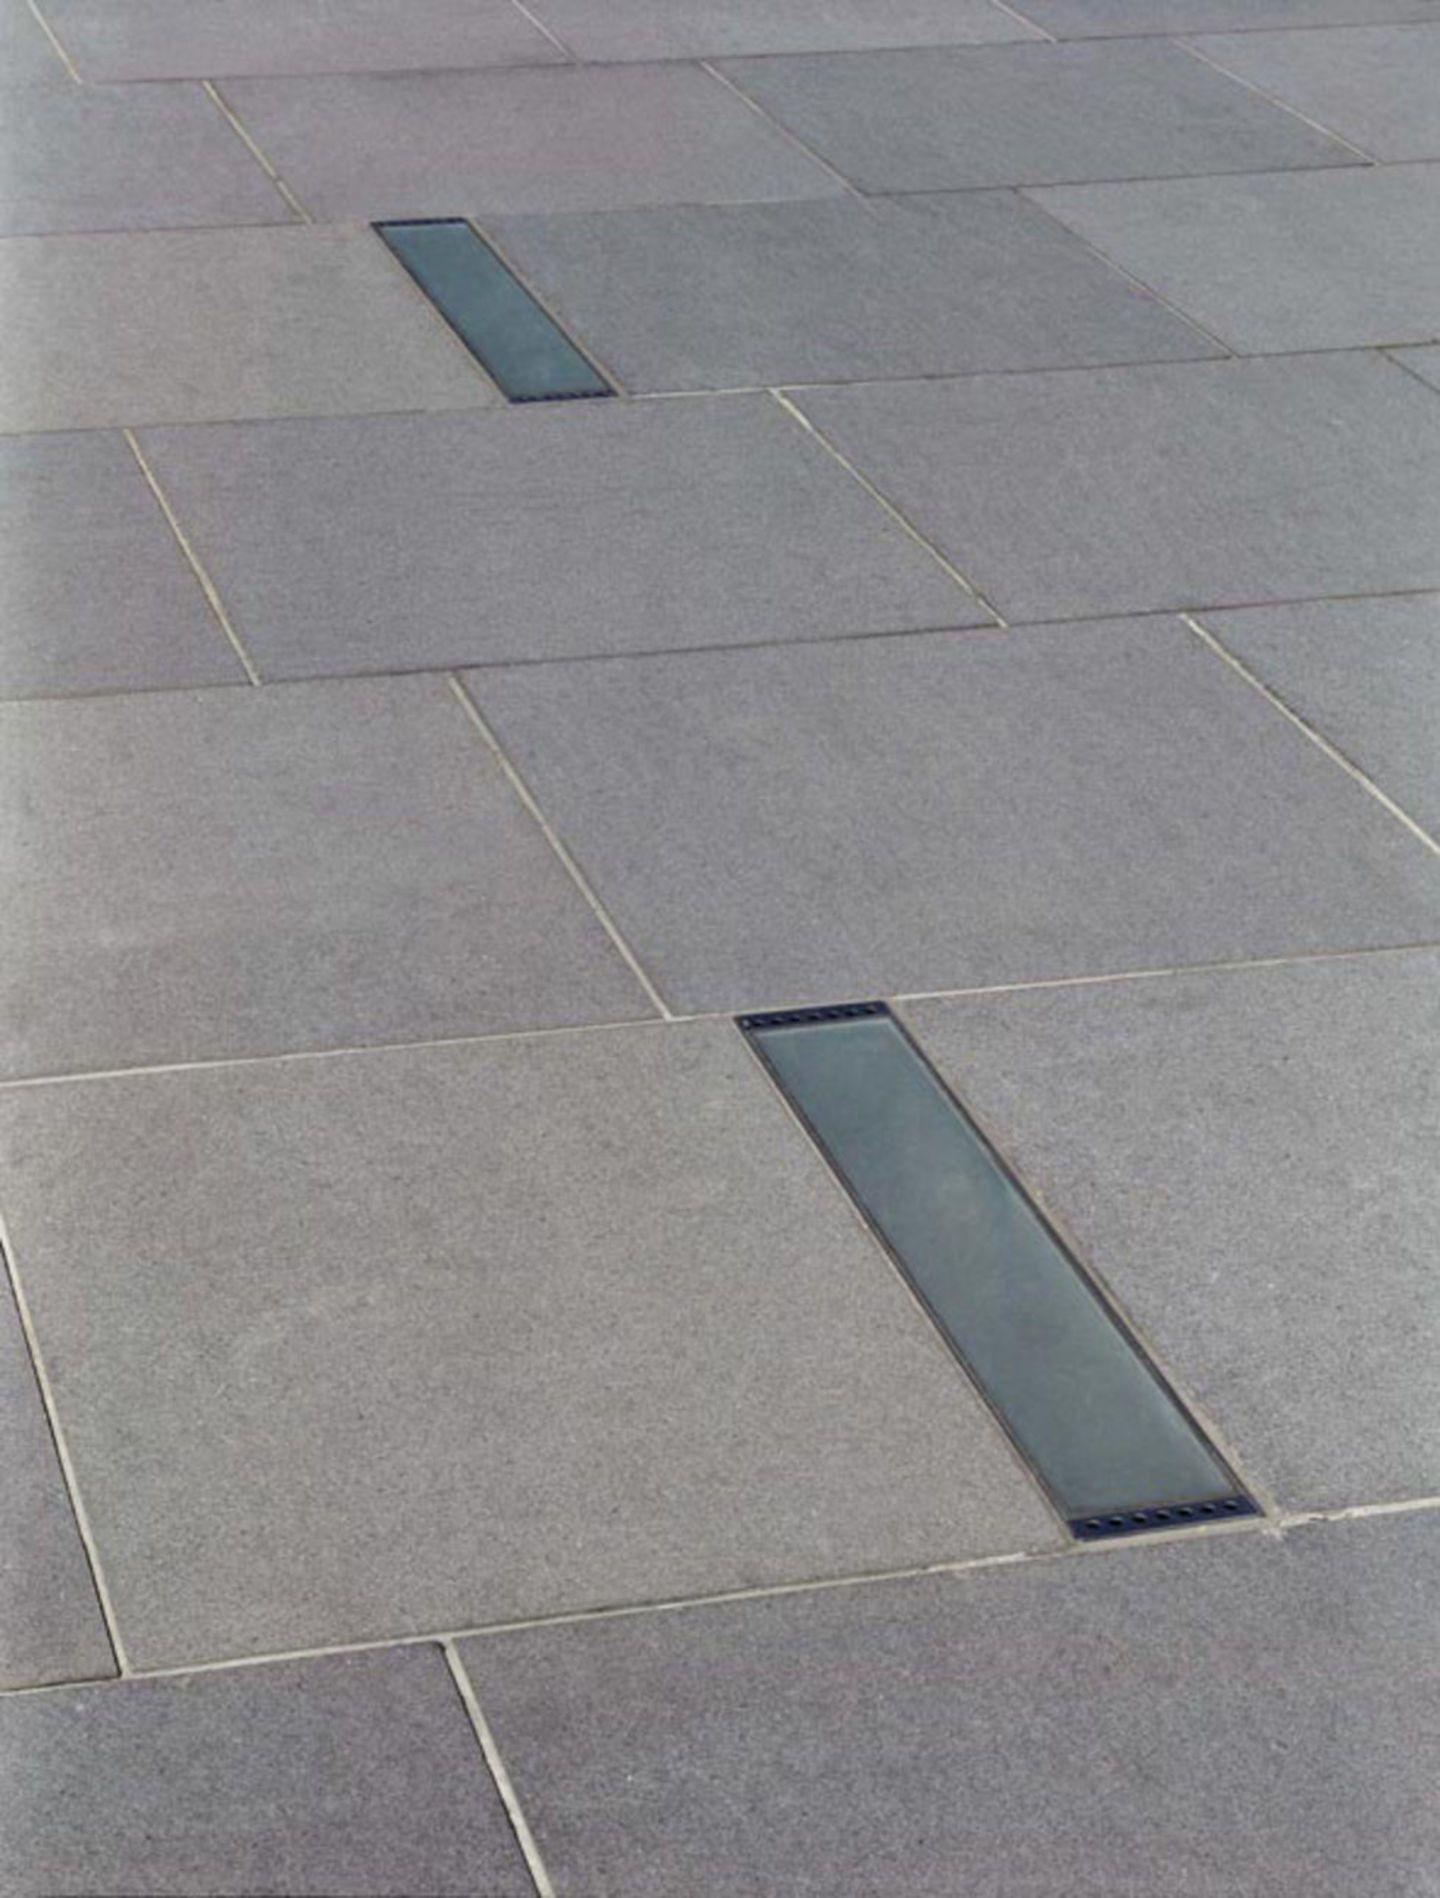 http://divisare.com/projects/17110-mangado-architects-christian-desile-plaza-de-pey-berland